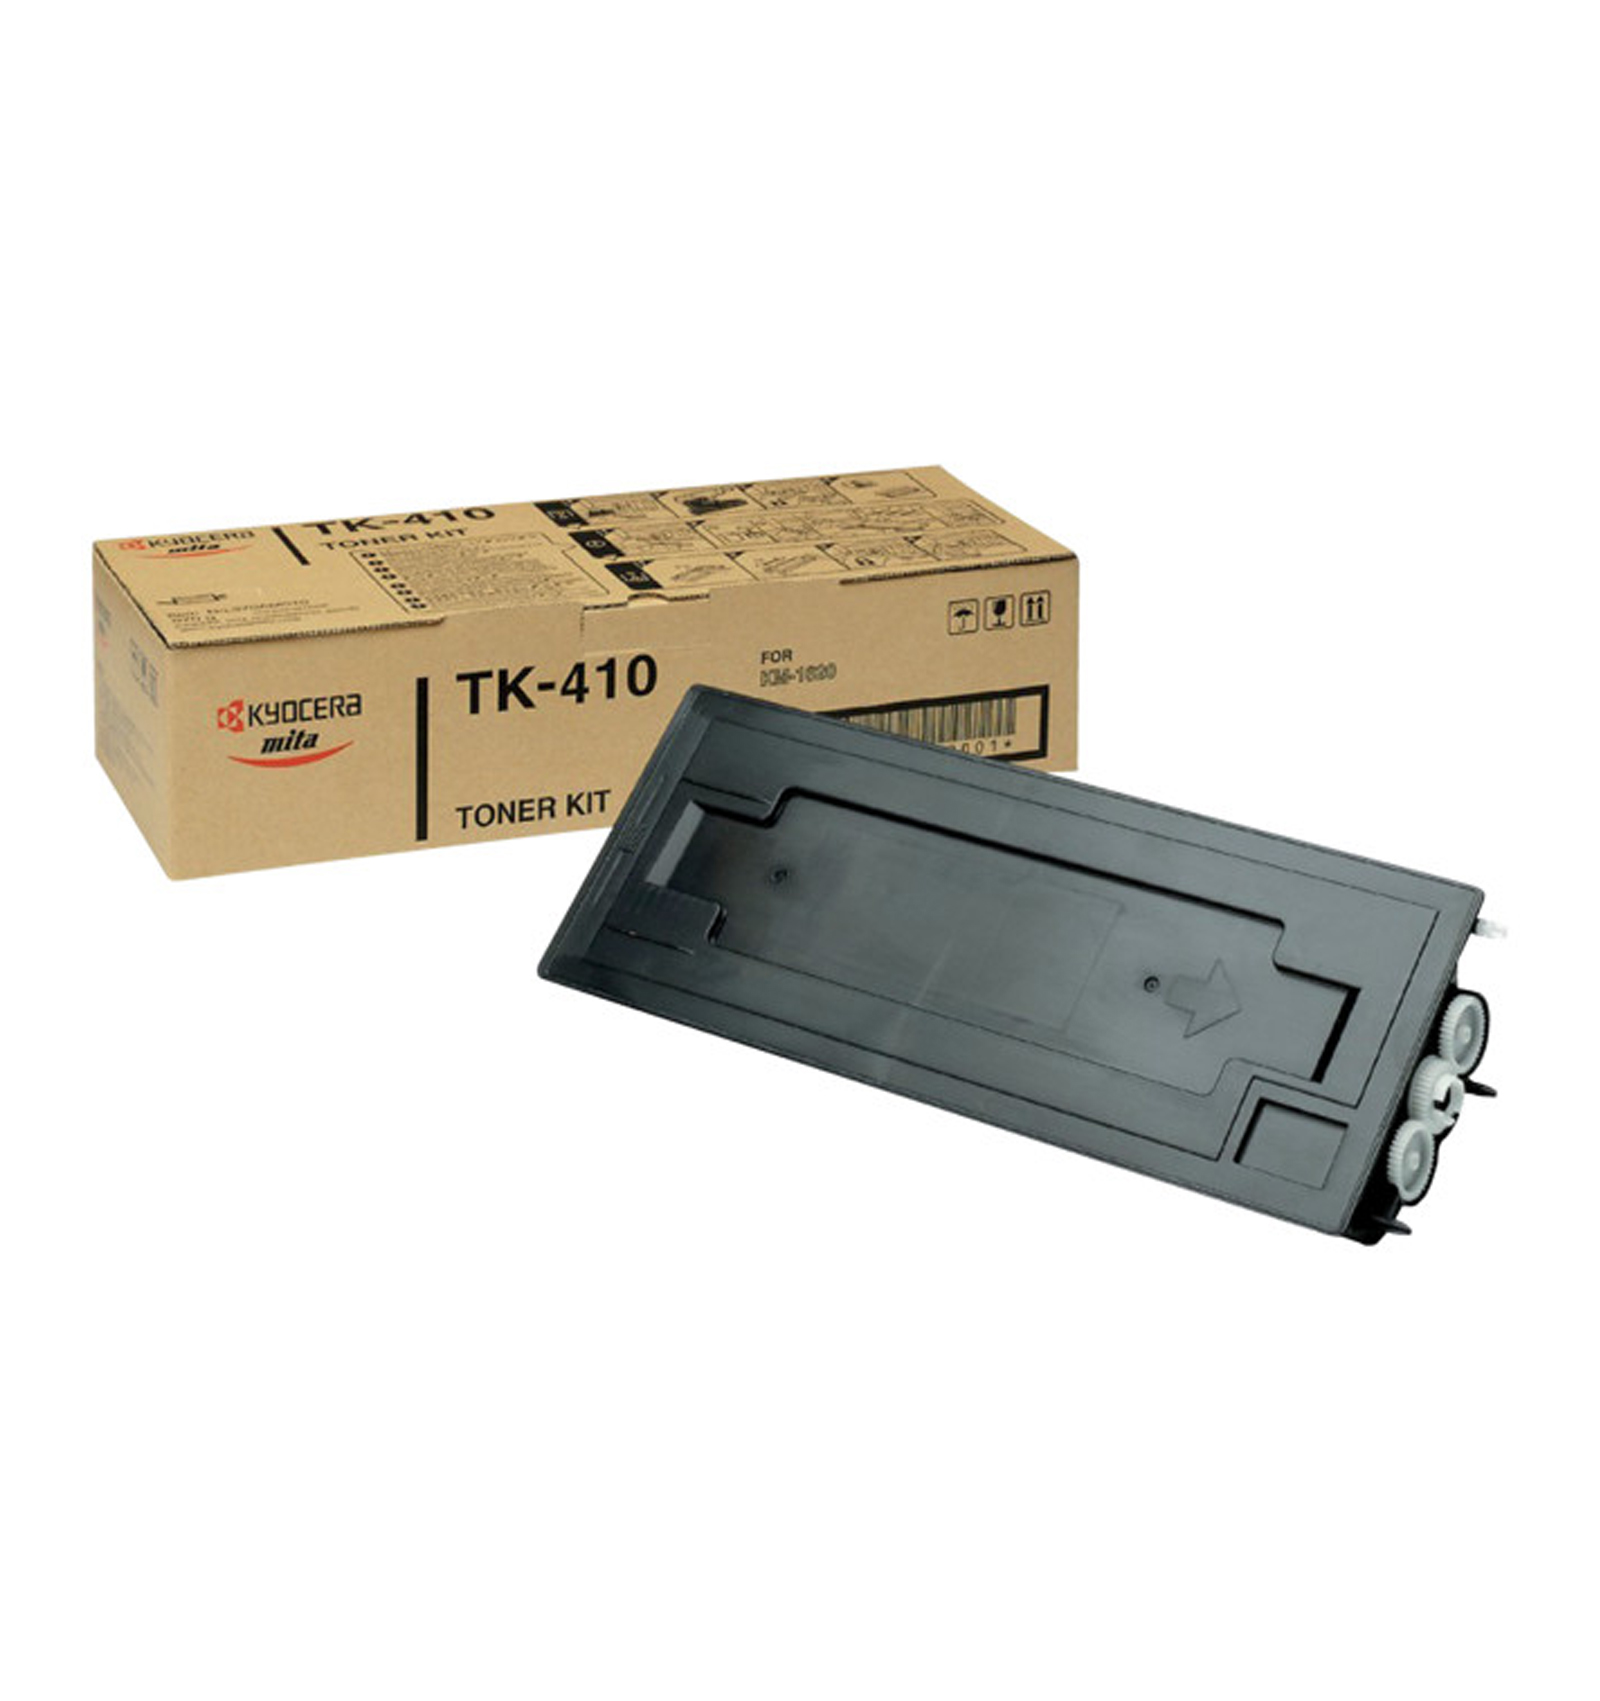 Kyocera TK-410 для KM-1620/1635/1650/2020/2035/2050